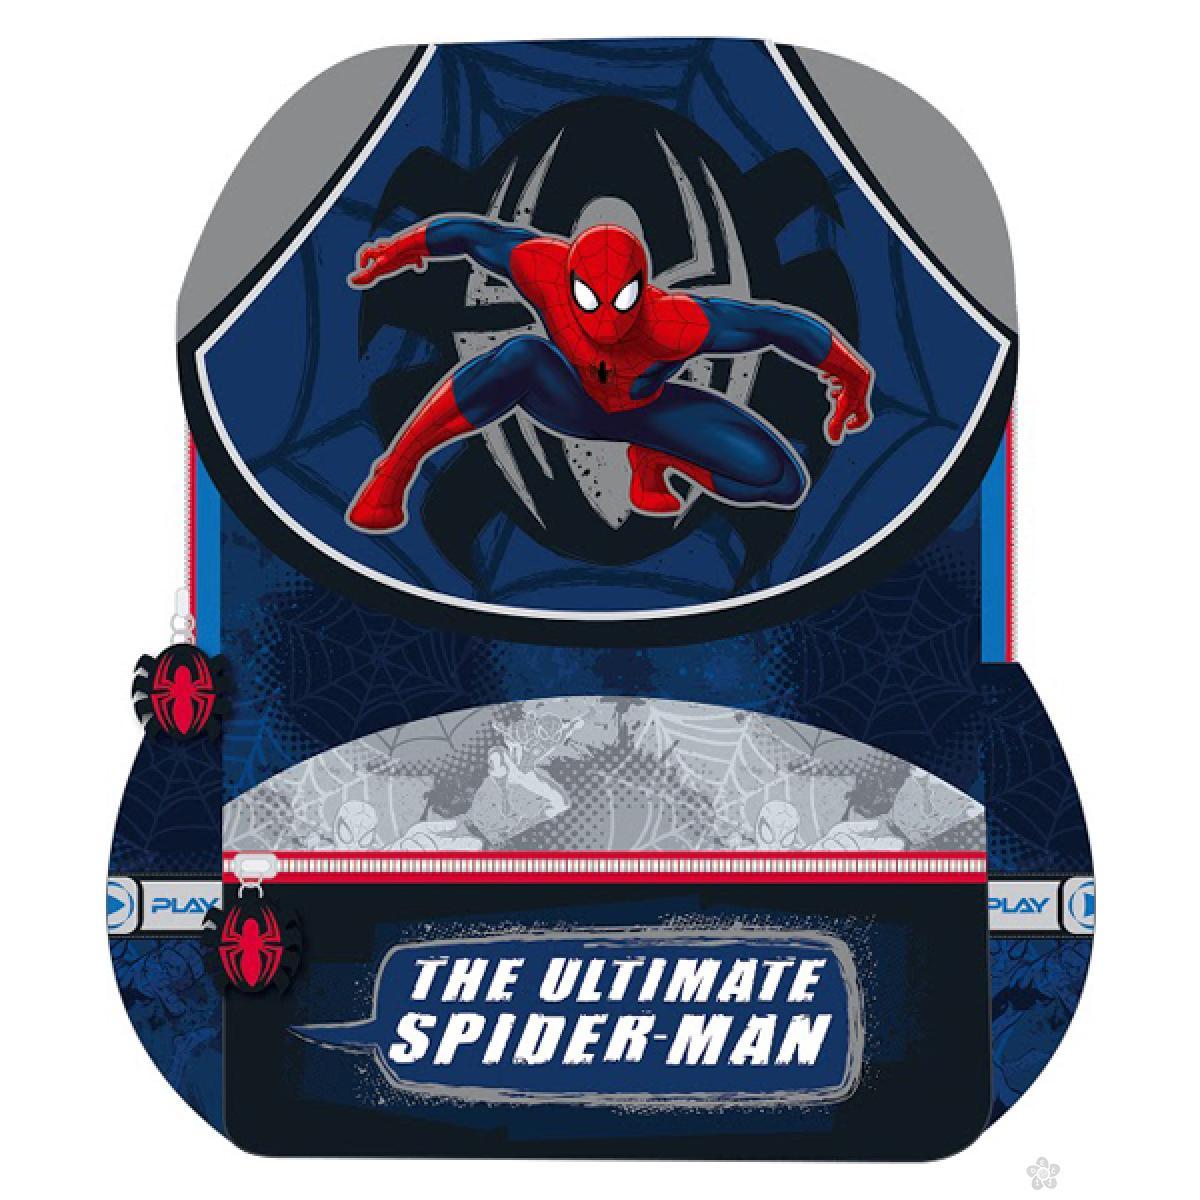 Anatomski ranac Spiderman Ultimate